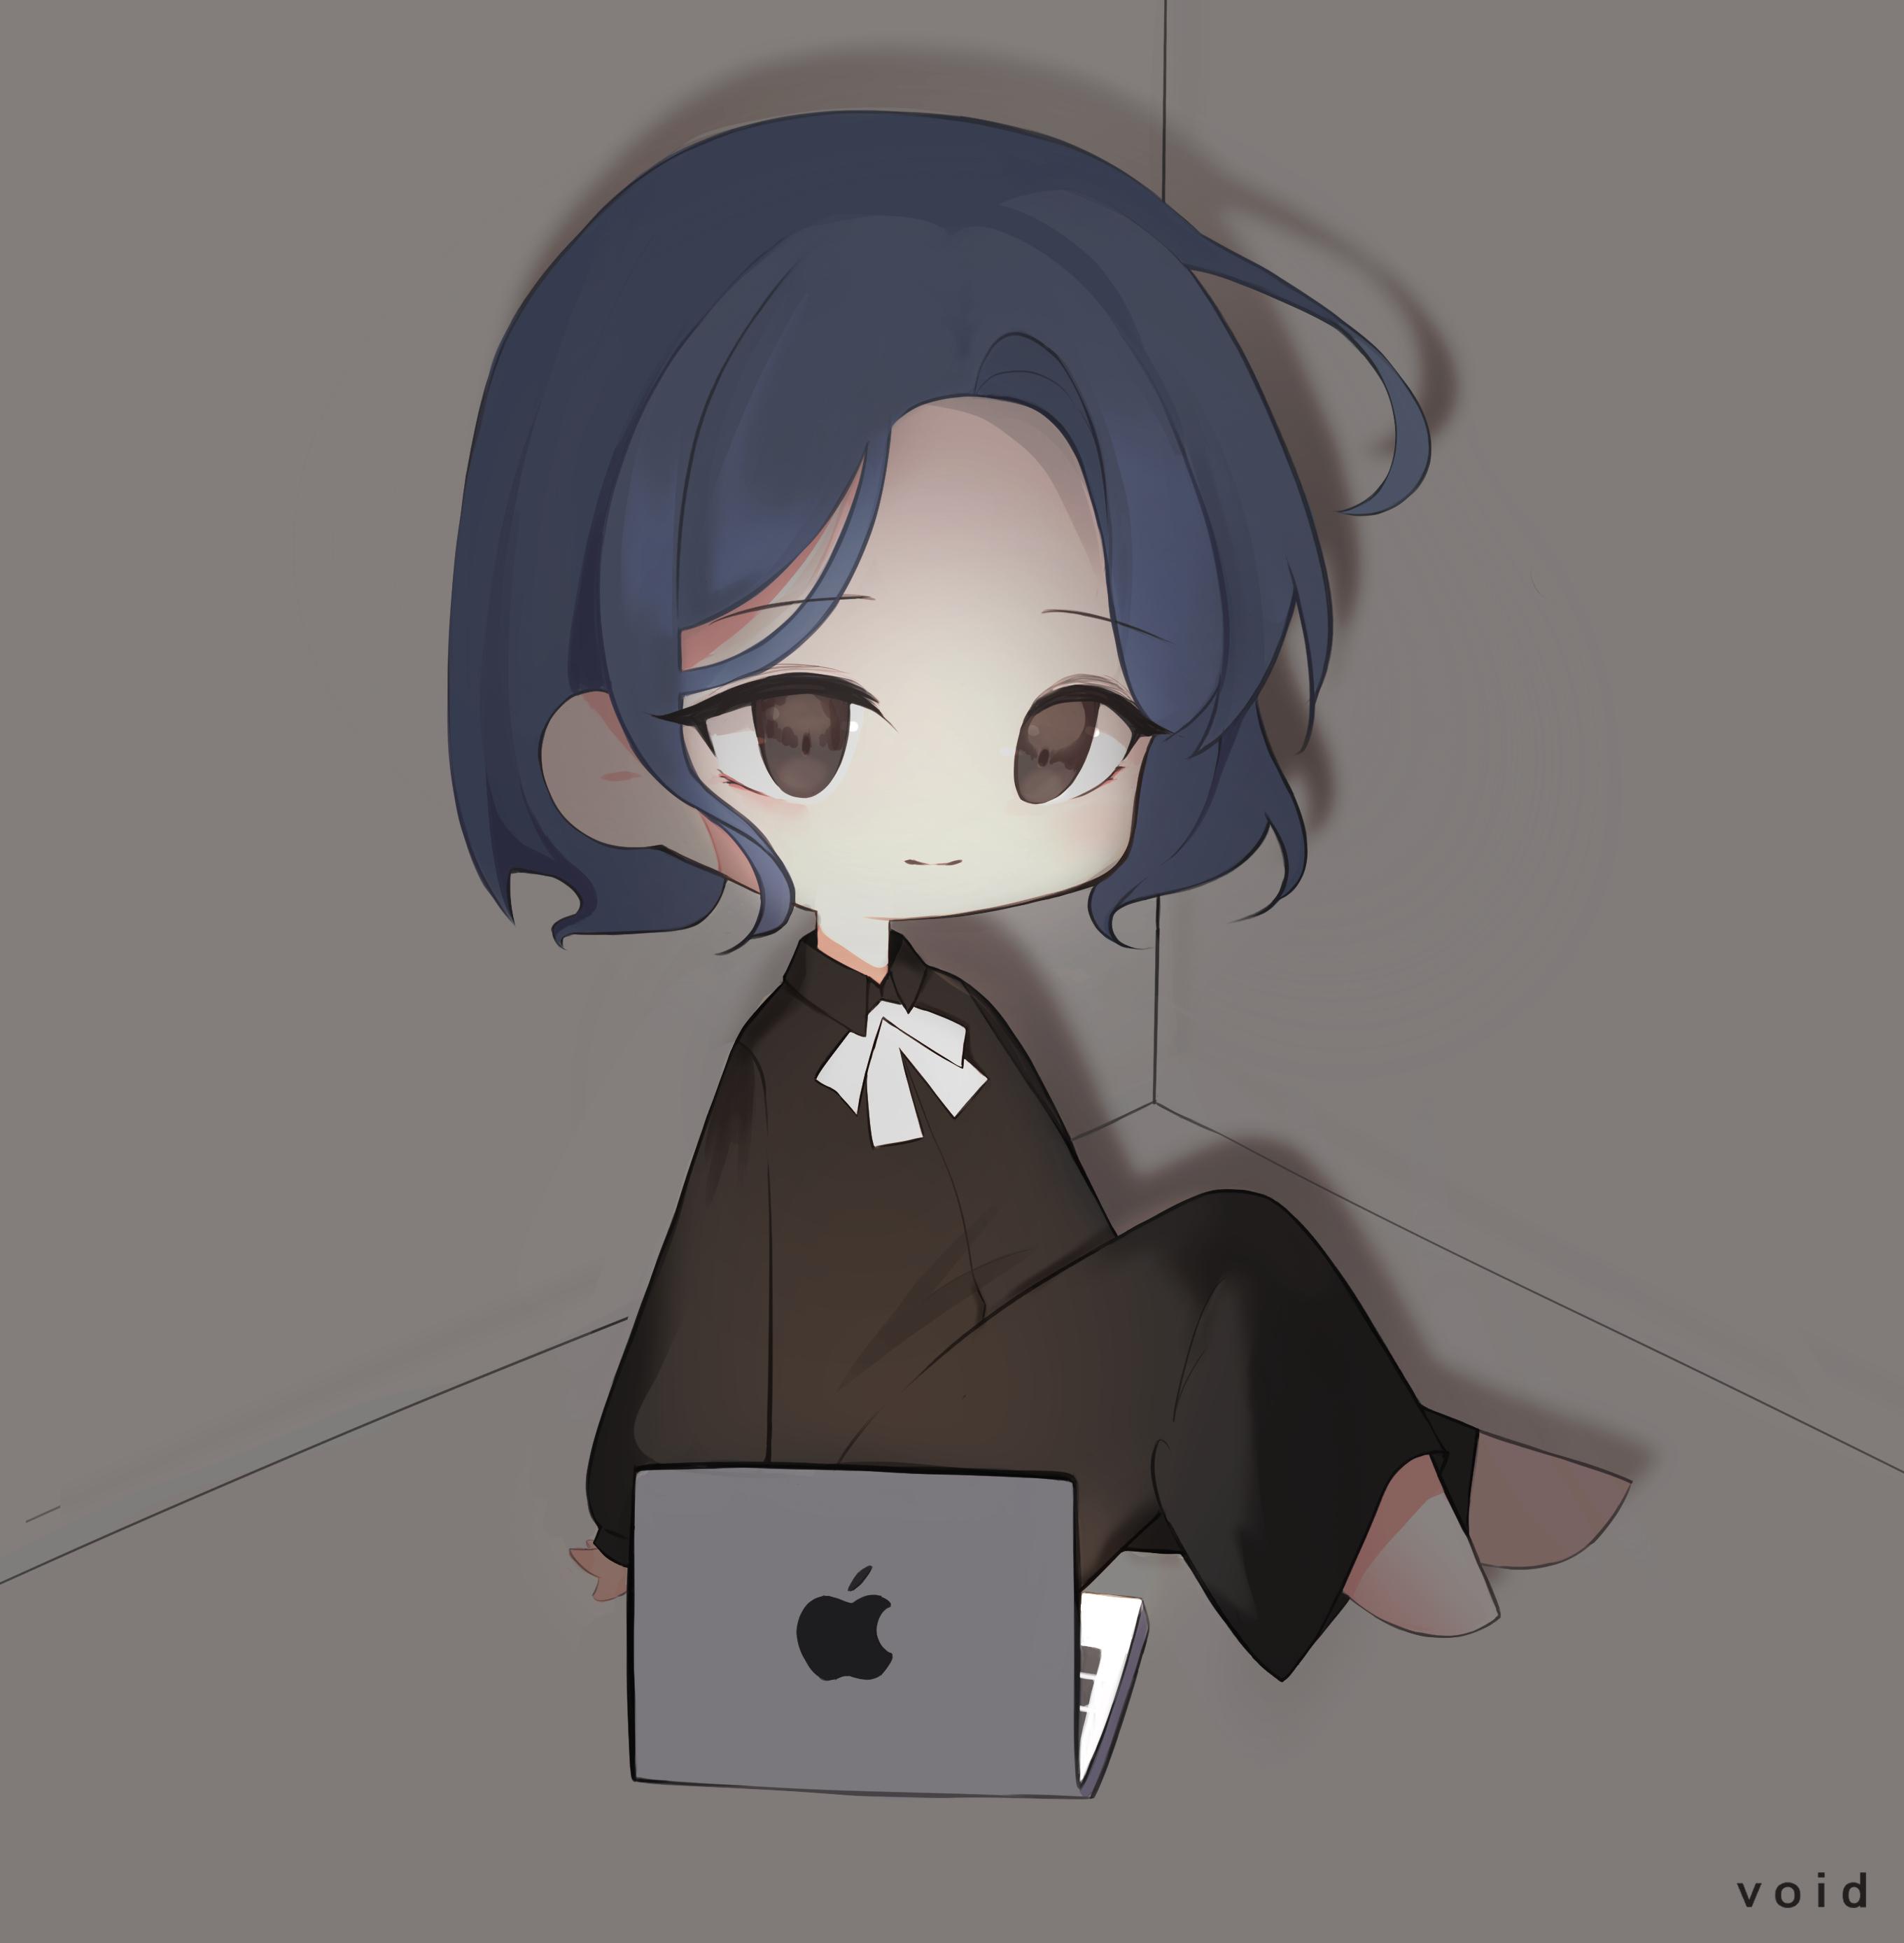 void 프로필